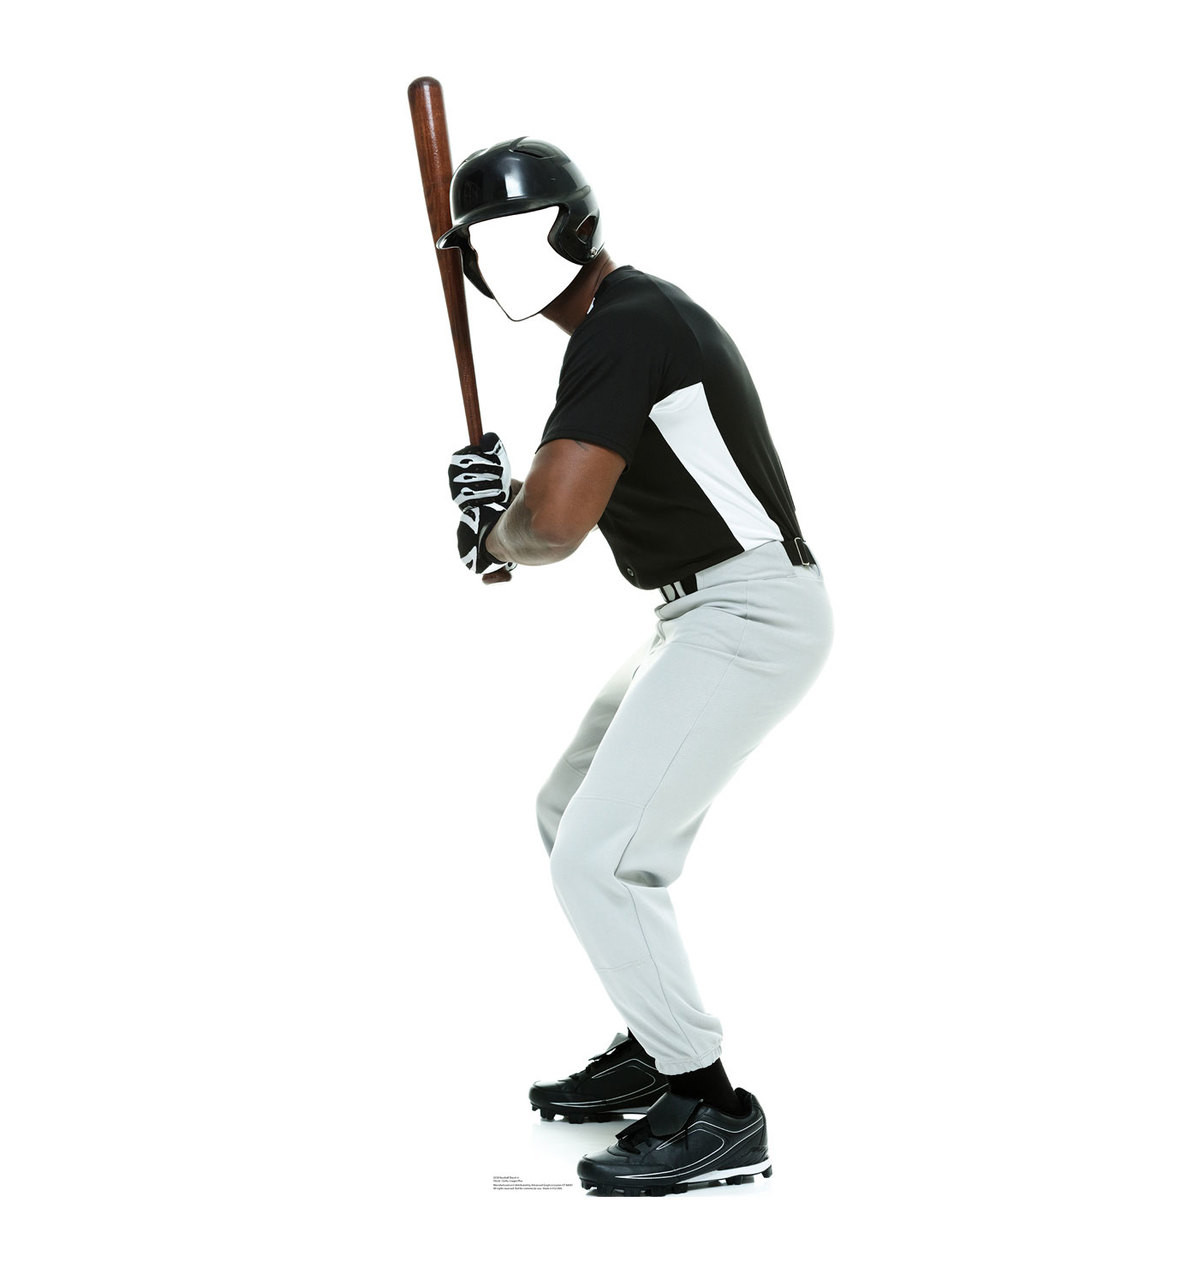 Life-size Baseball player Stand-In Cardboard Standup | Cardboard Cutout 1